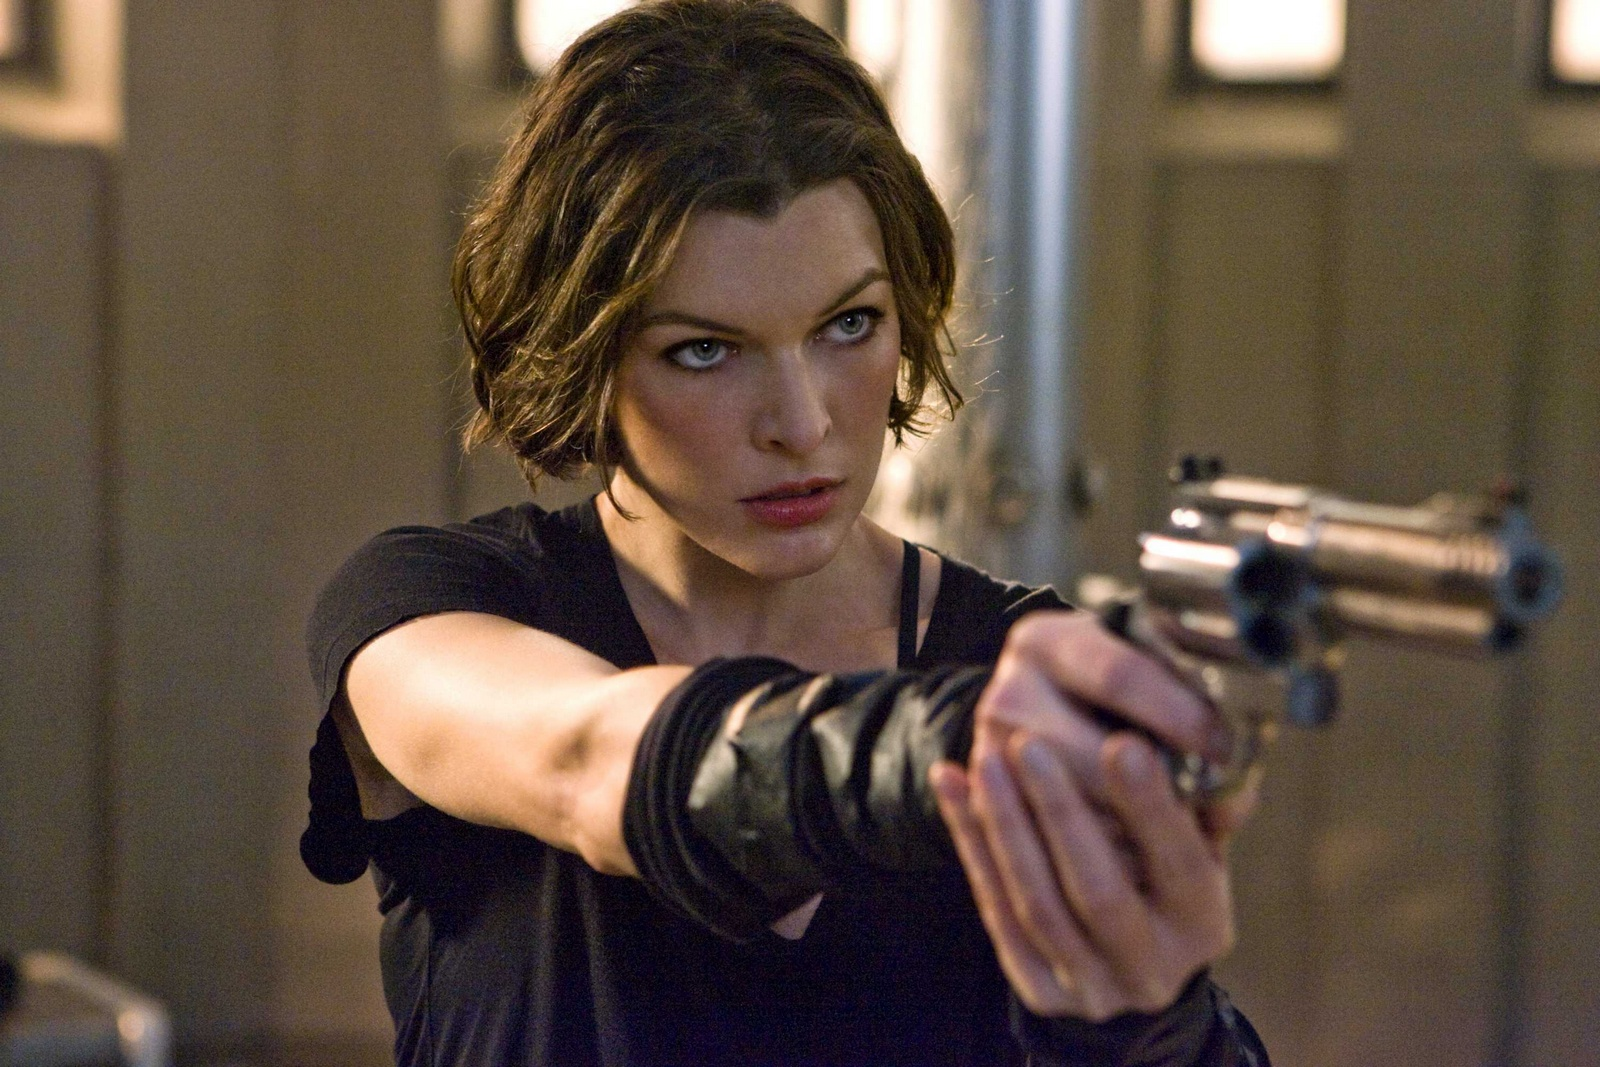 Milla Jovovich action movies